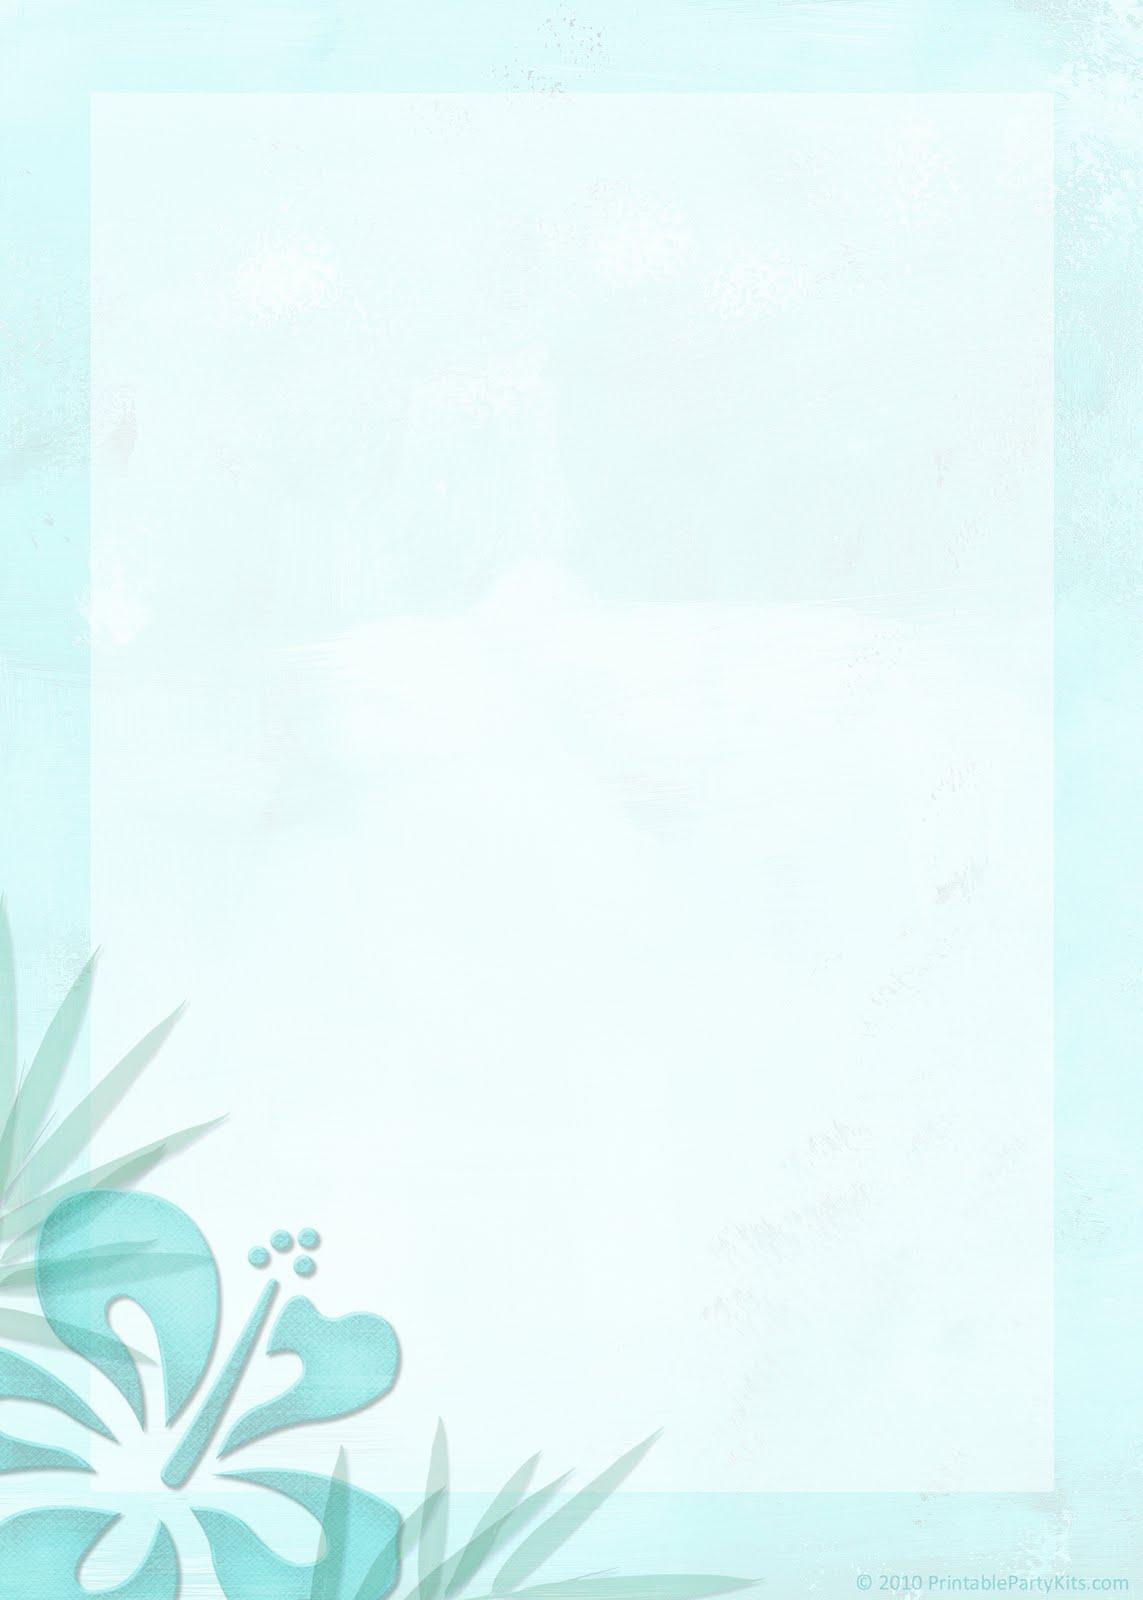 Free Printable Party Invitations: Printable Tropical Beach Theme Wedding Invitation Template